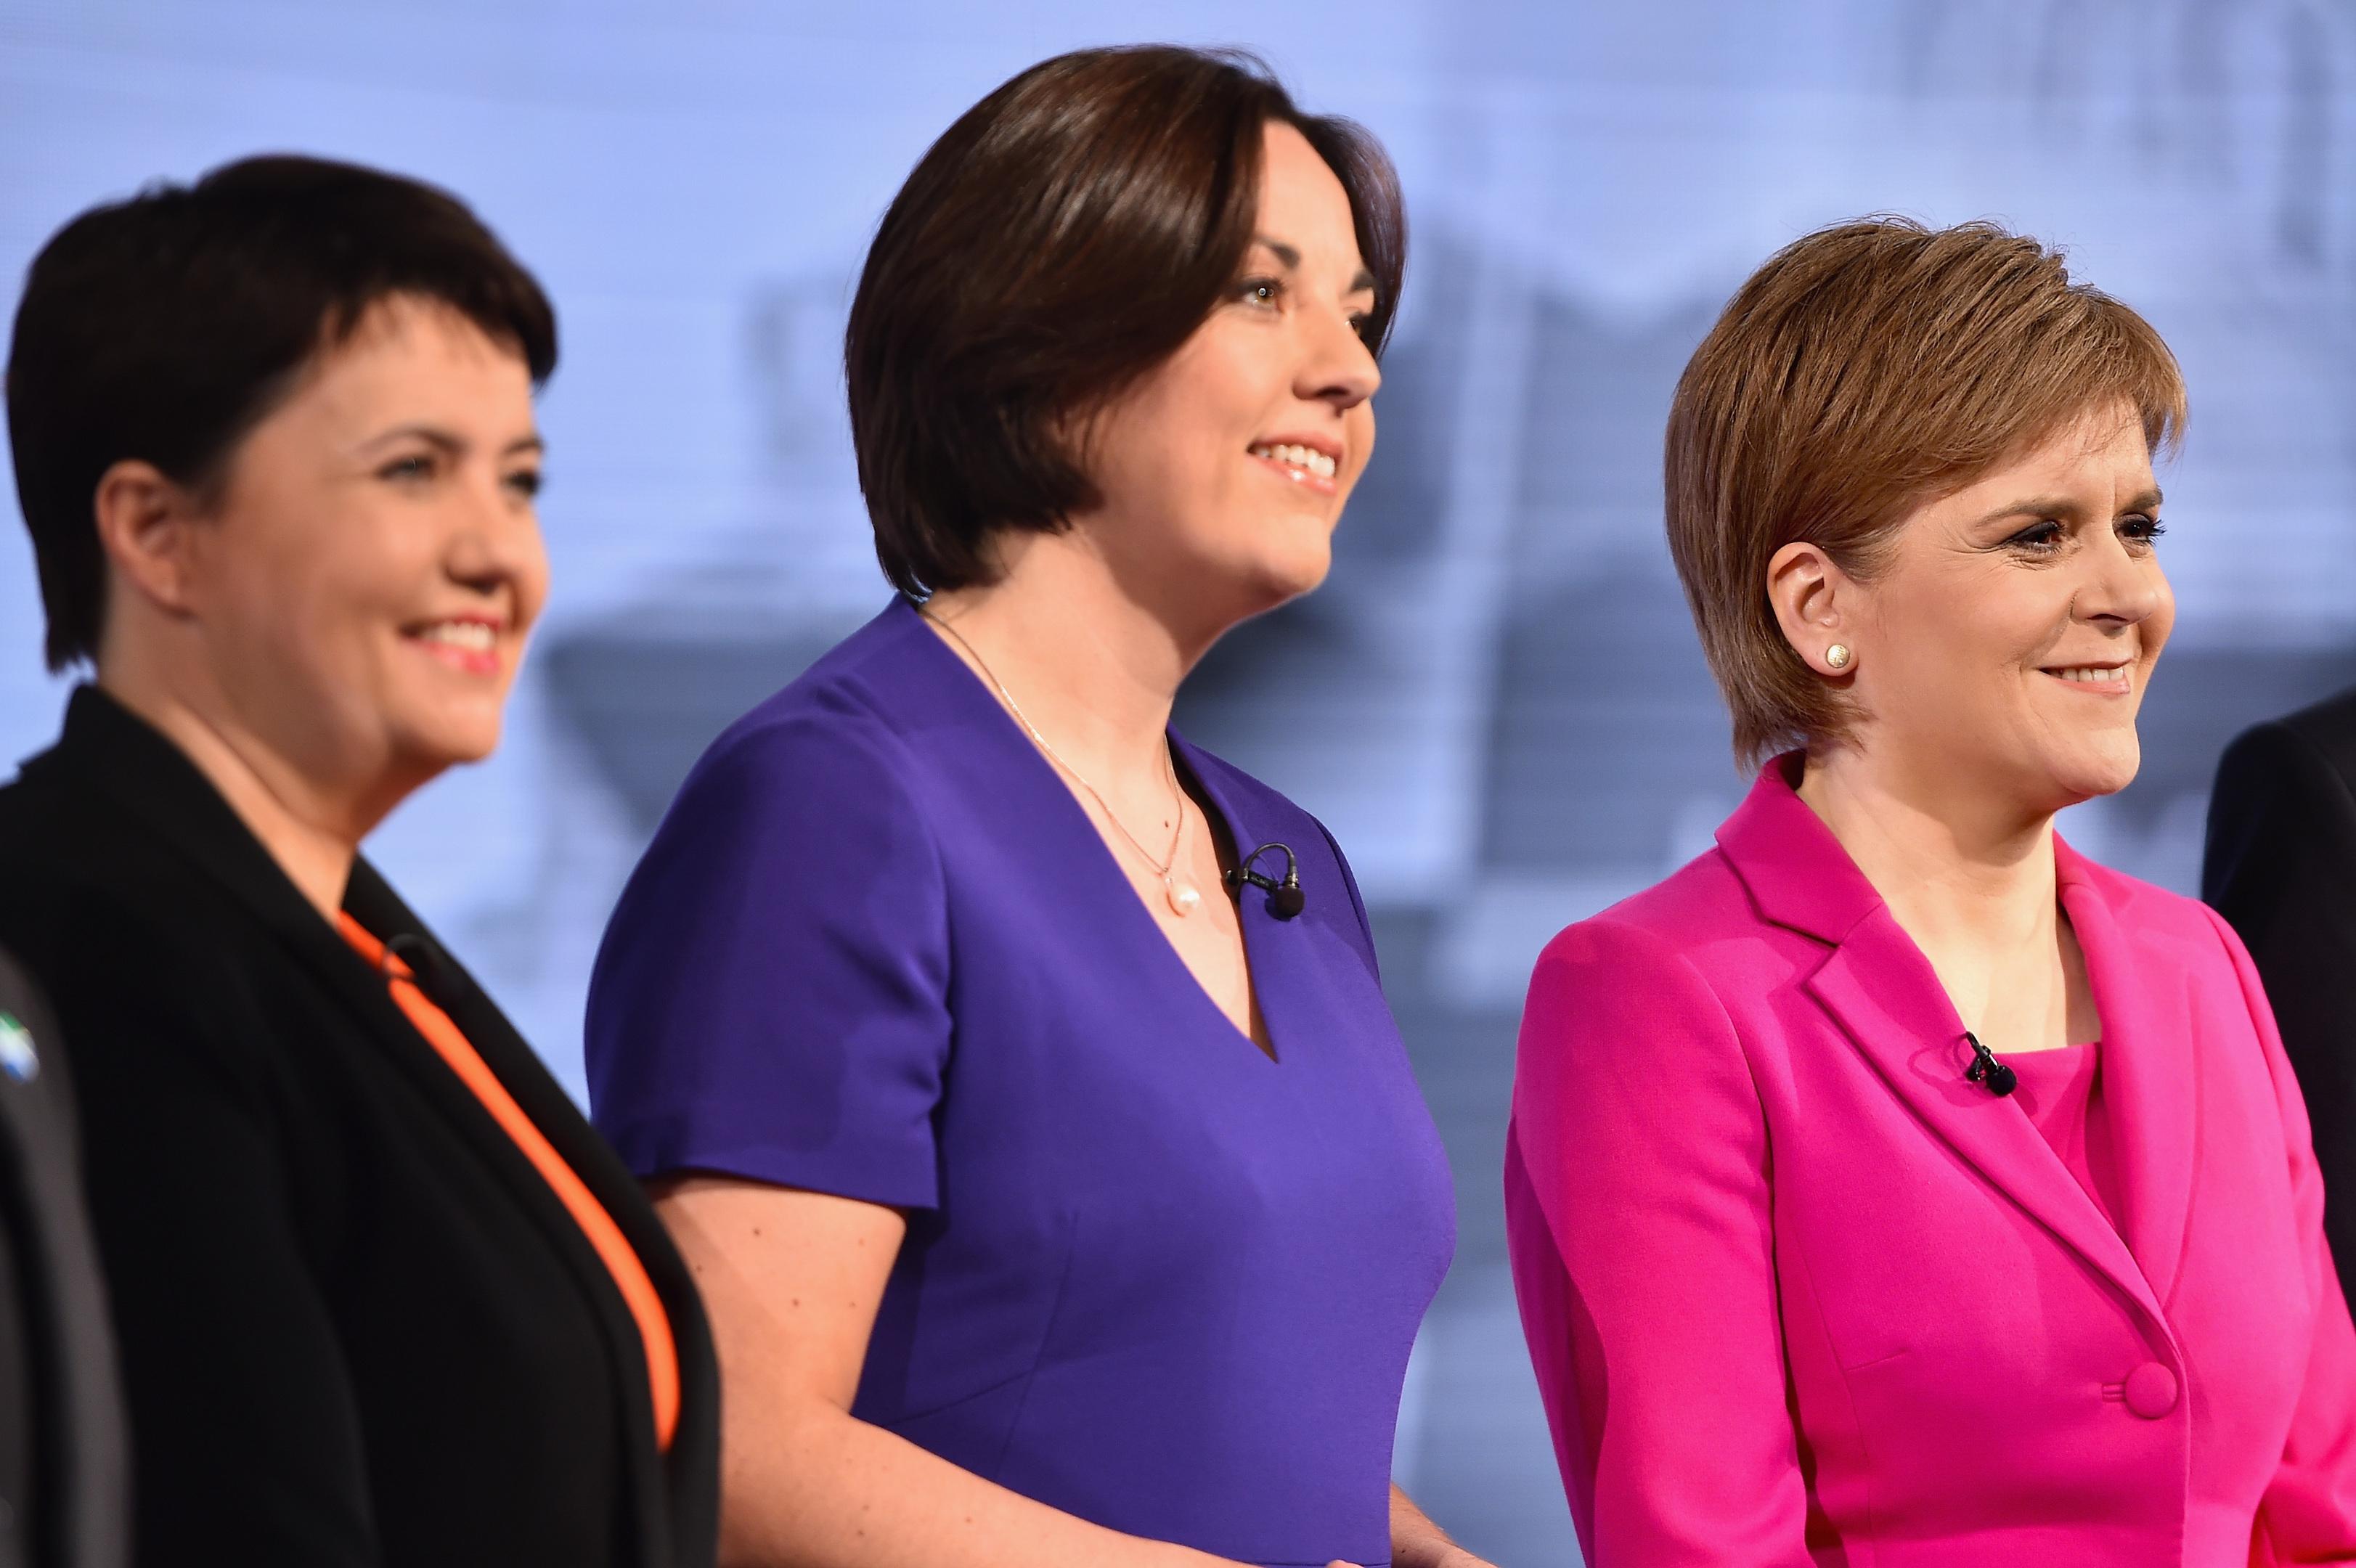 (L-R) Ruth Davidson of the Scottish Conservatives, Scottish Labour's Kezia Dugdale and SNP leader Nicola Sturgeon (Jeff J Mitchell/Getty Images)